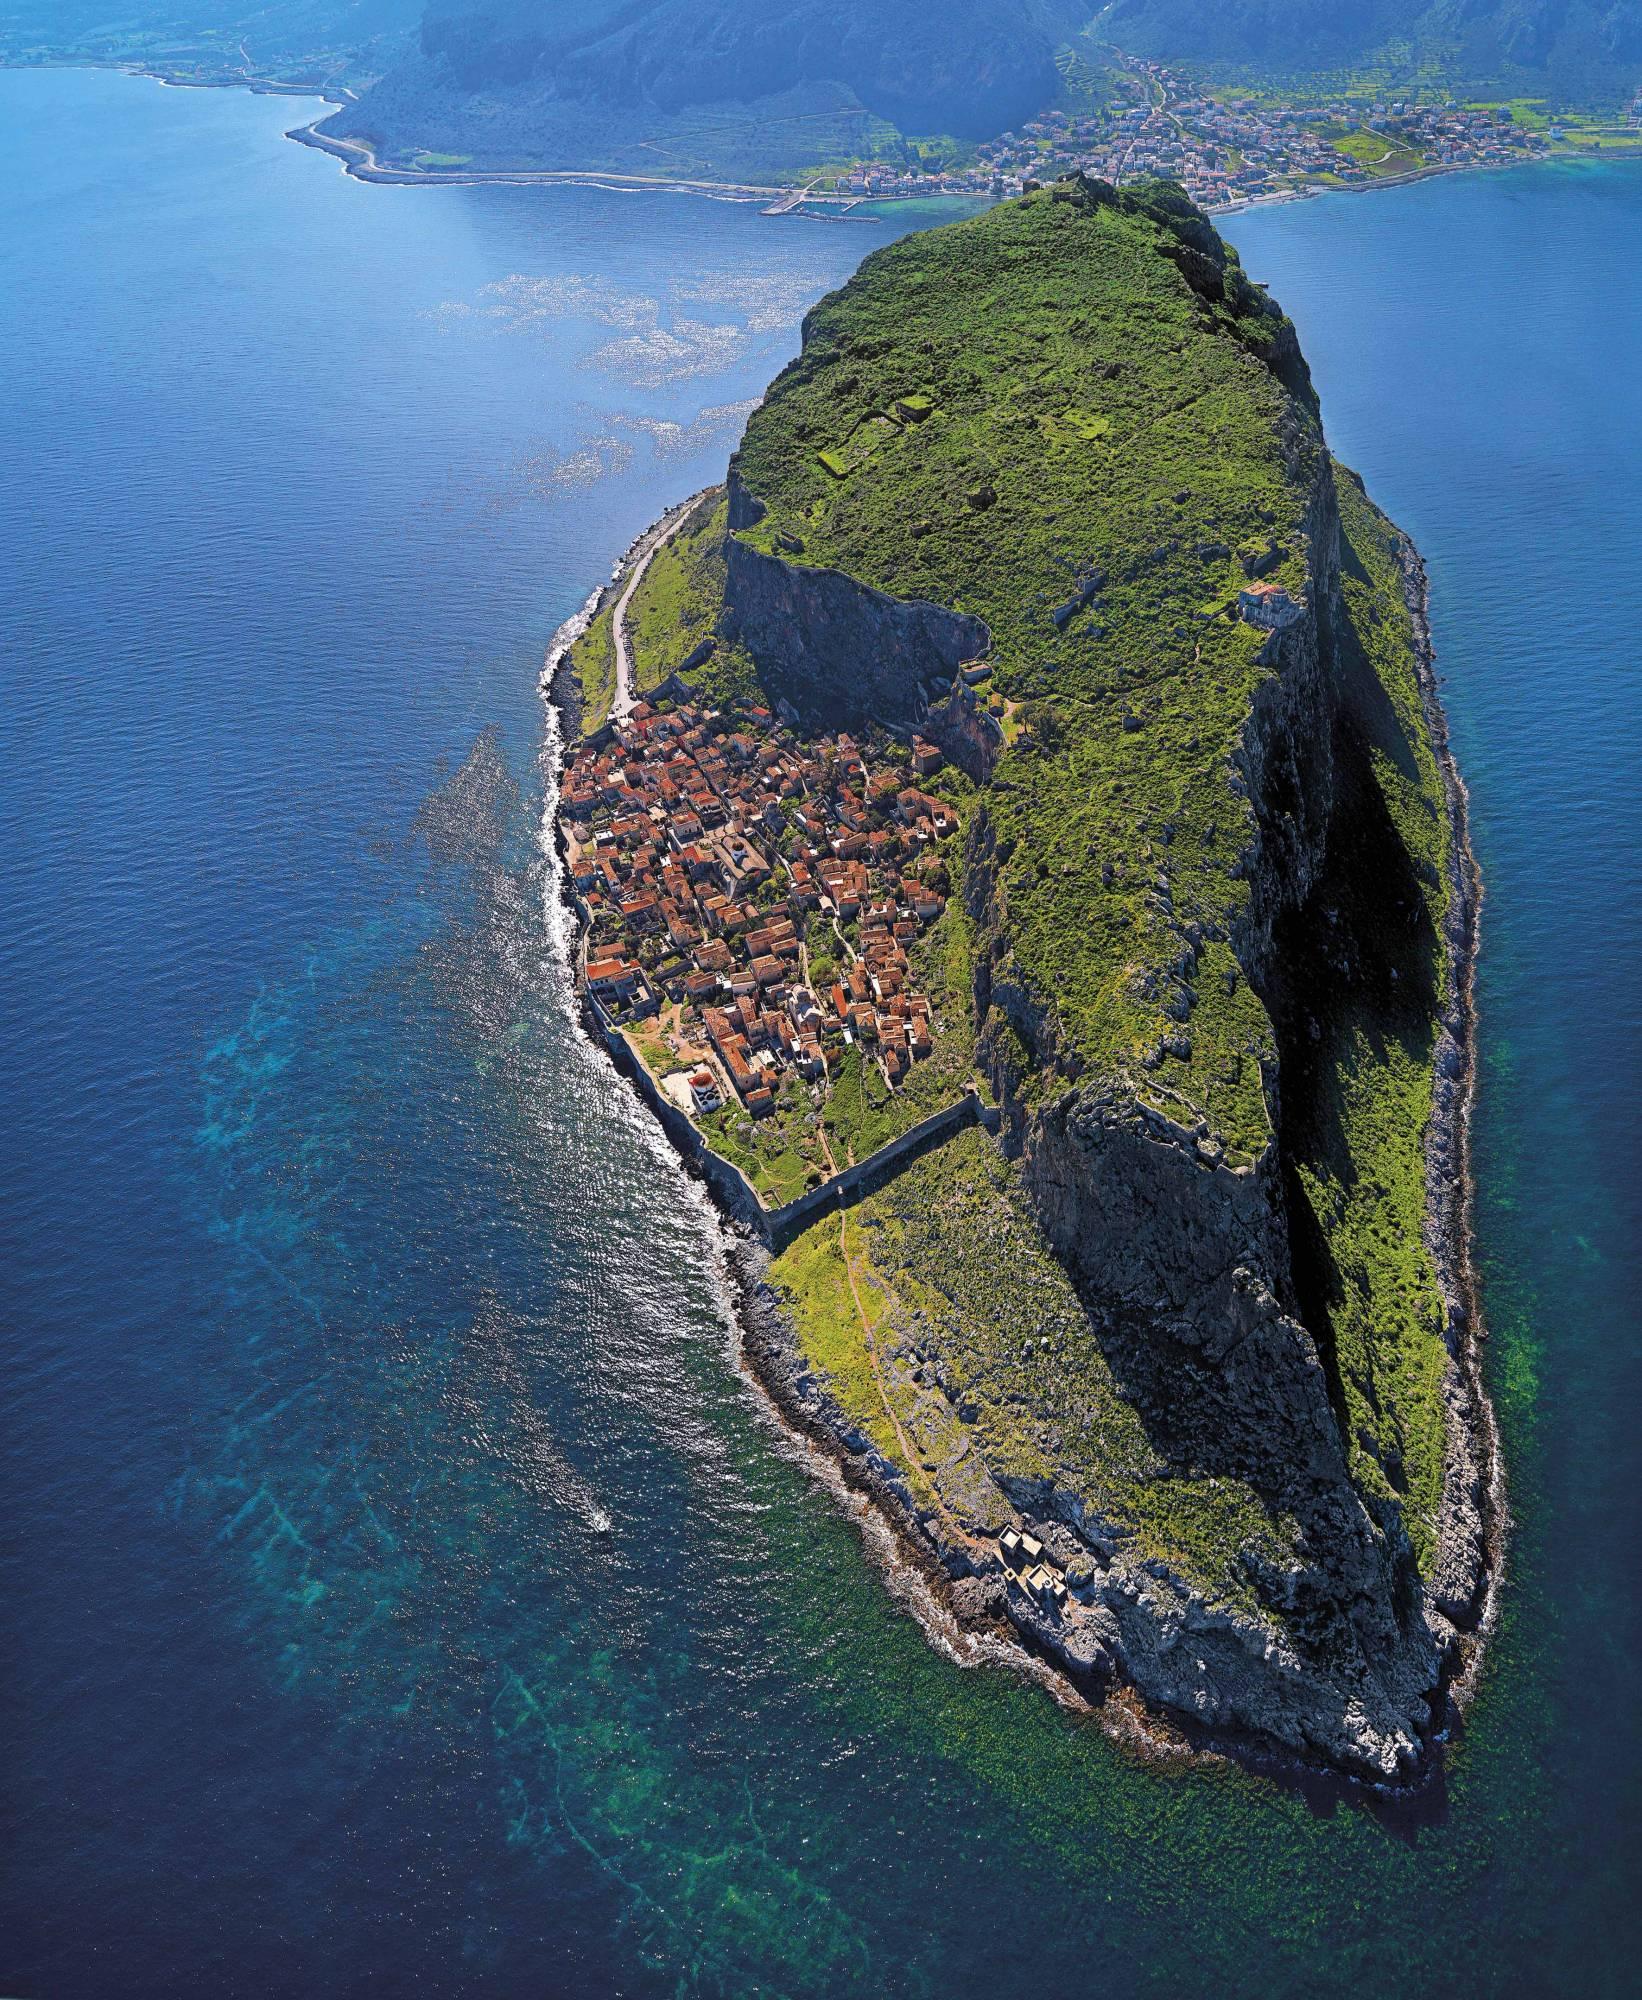 RT @mezvan: Un pueblo escondido en Grecia ... llamado Monemvasia http://t.co/xMtsEDPNEZ